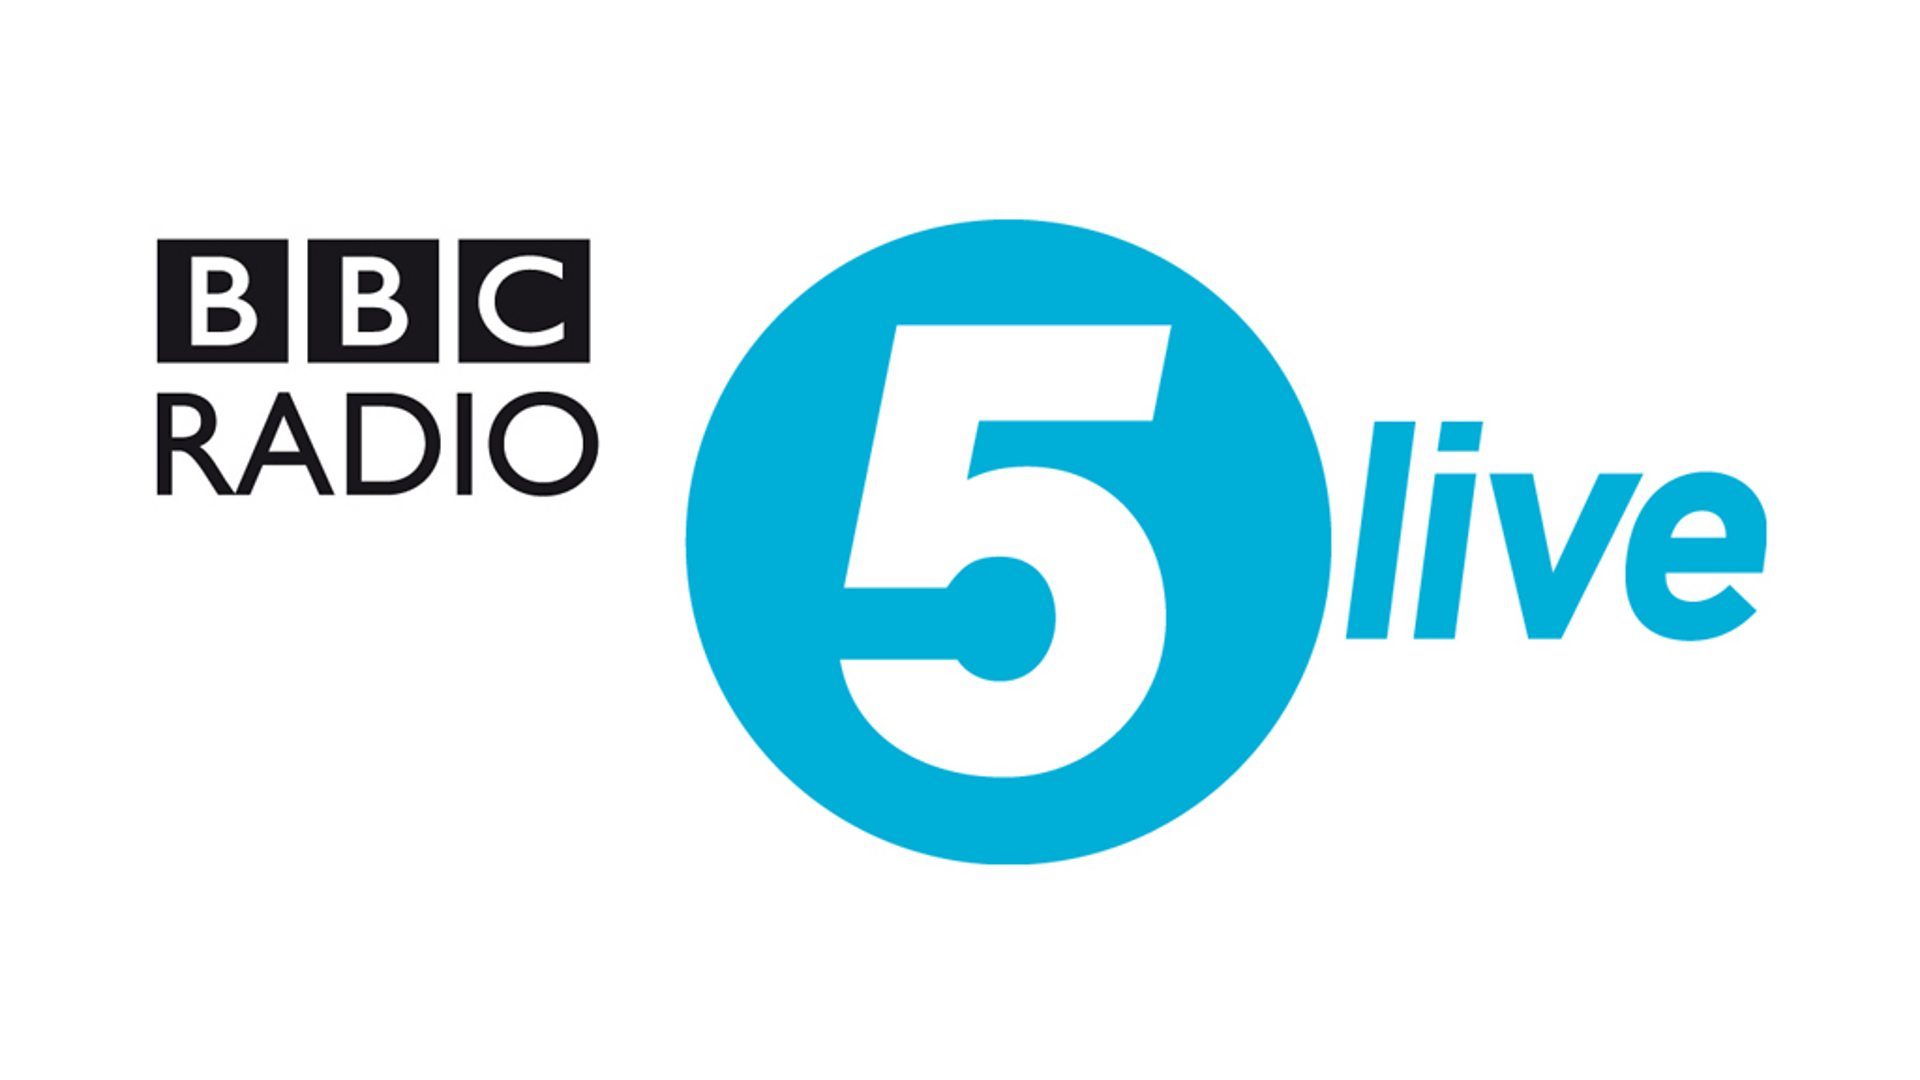 bbc radio 4 live